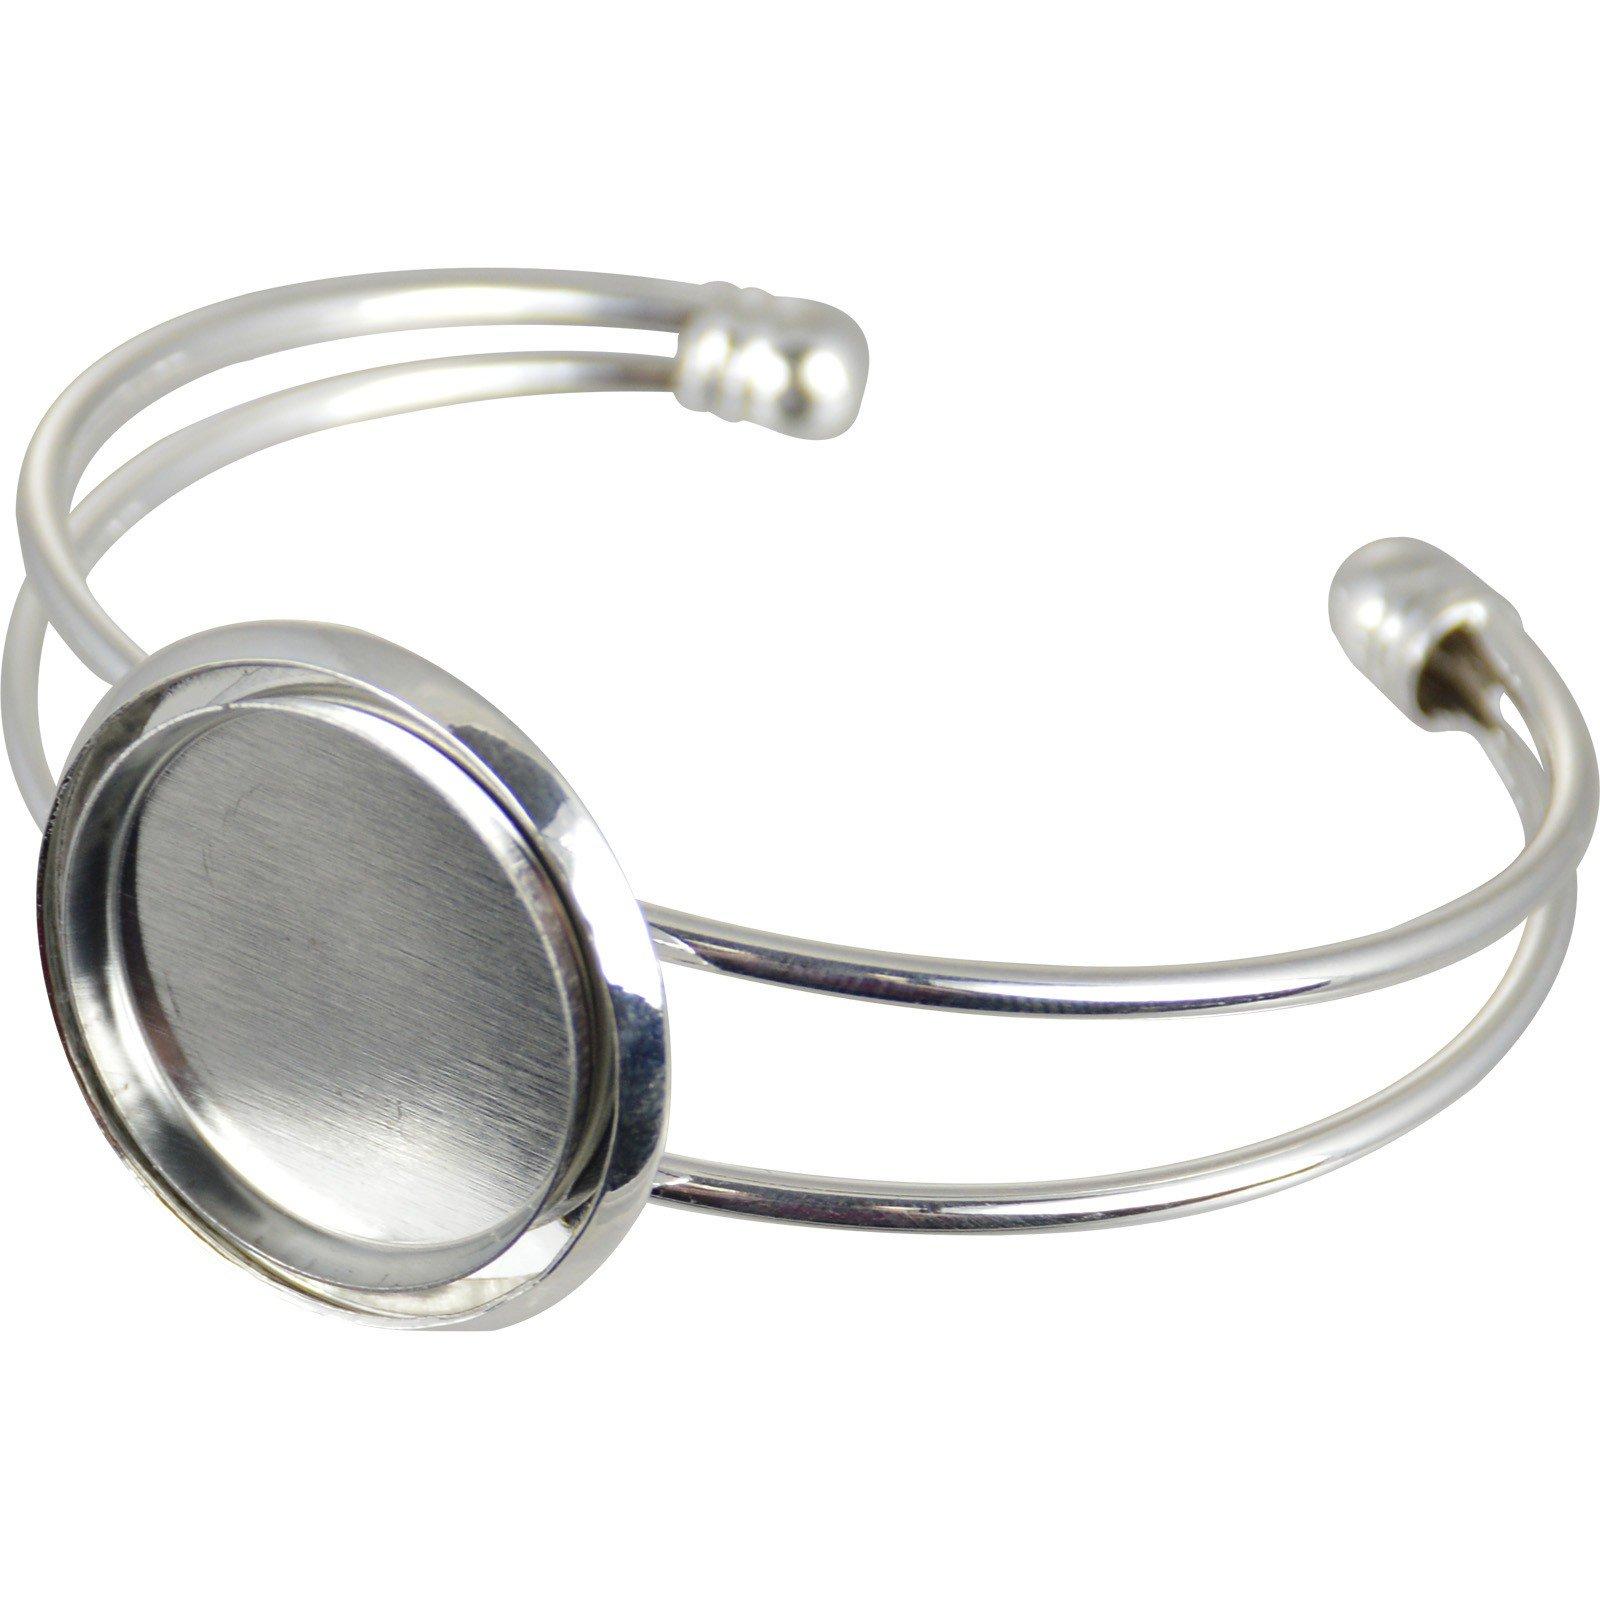 Magnet Bracelet - Clasp Style